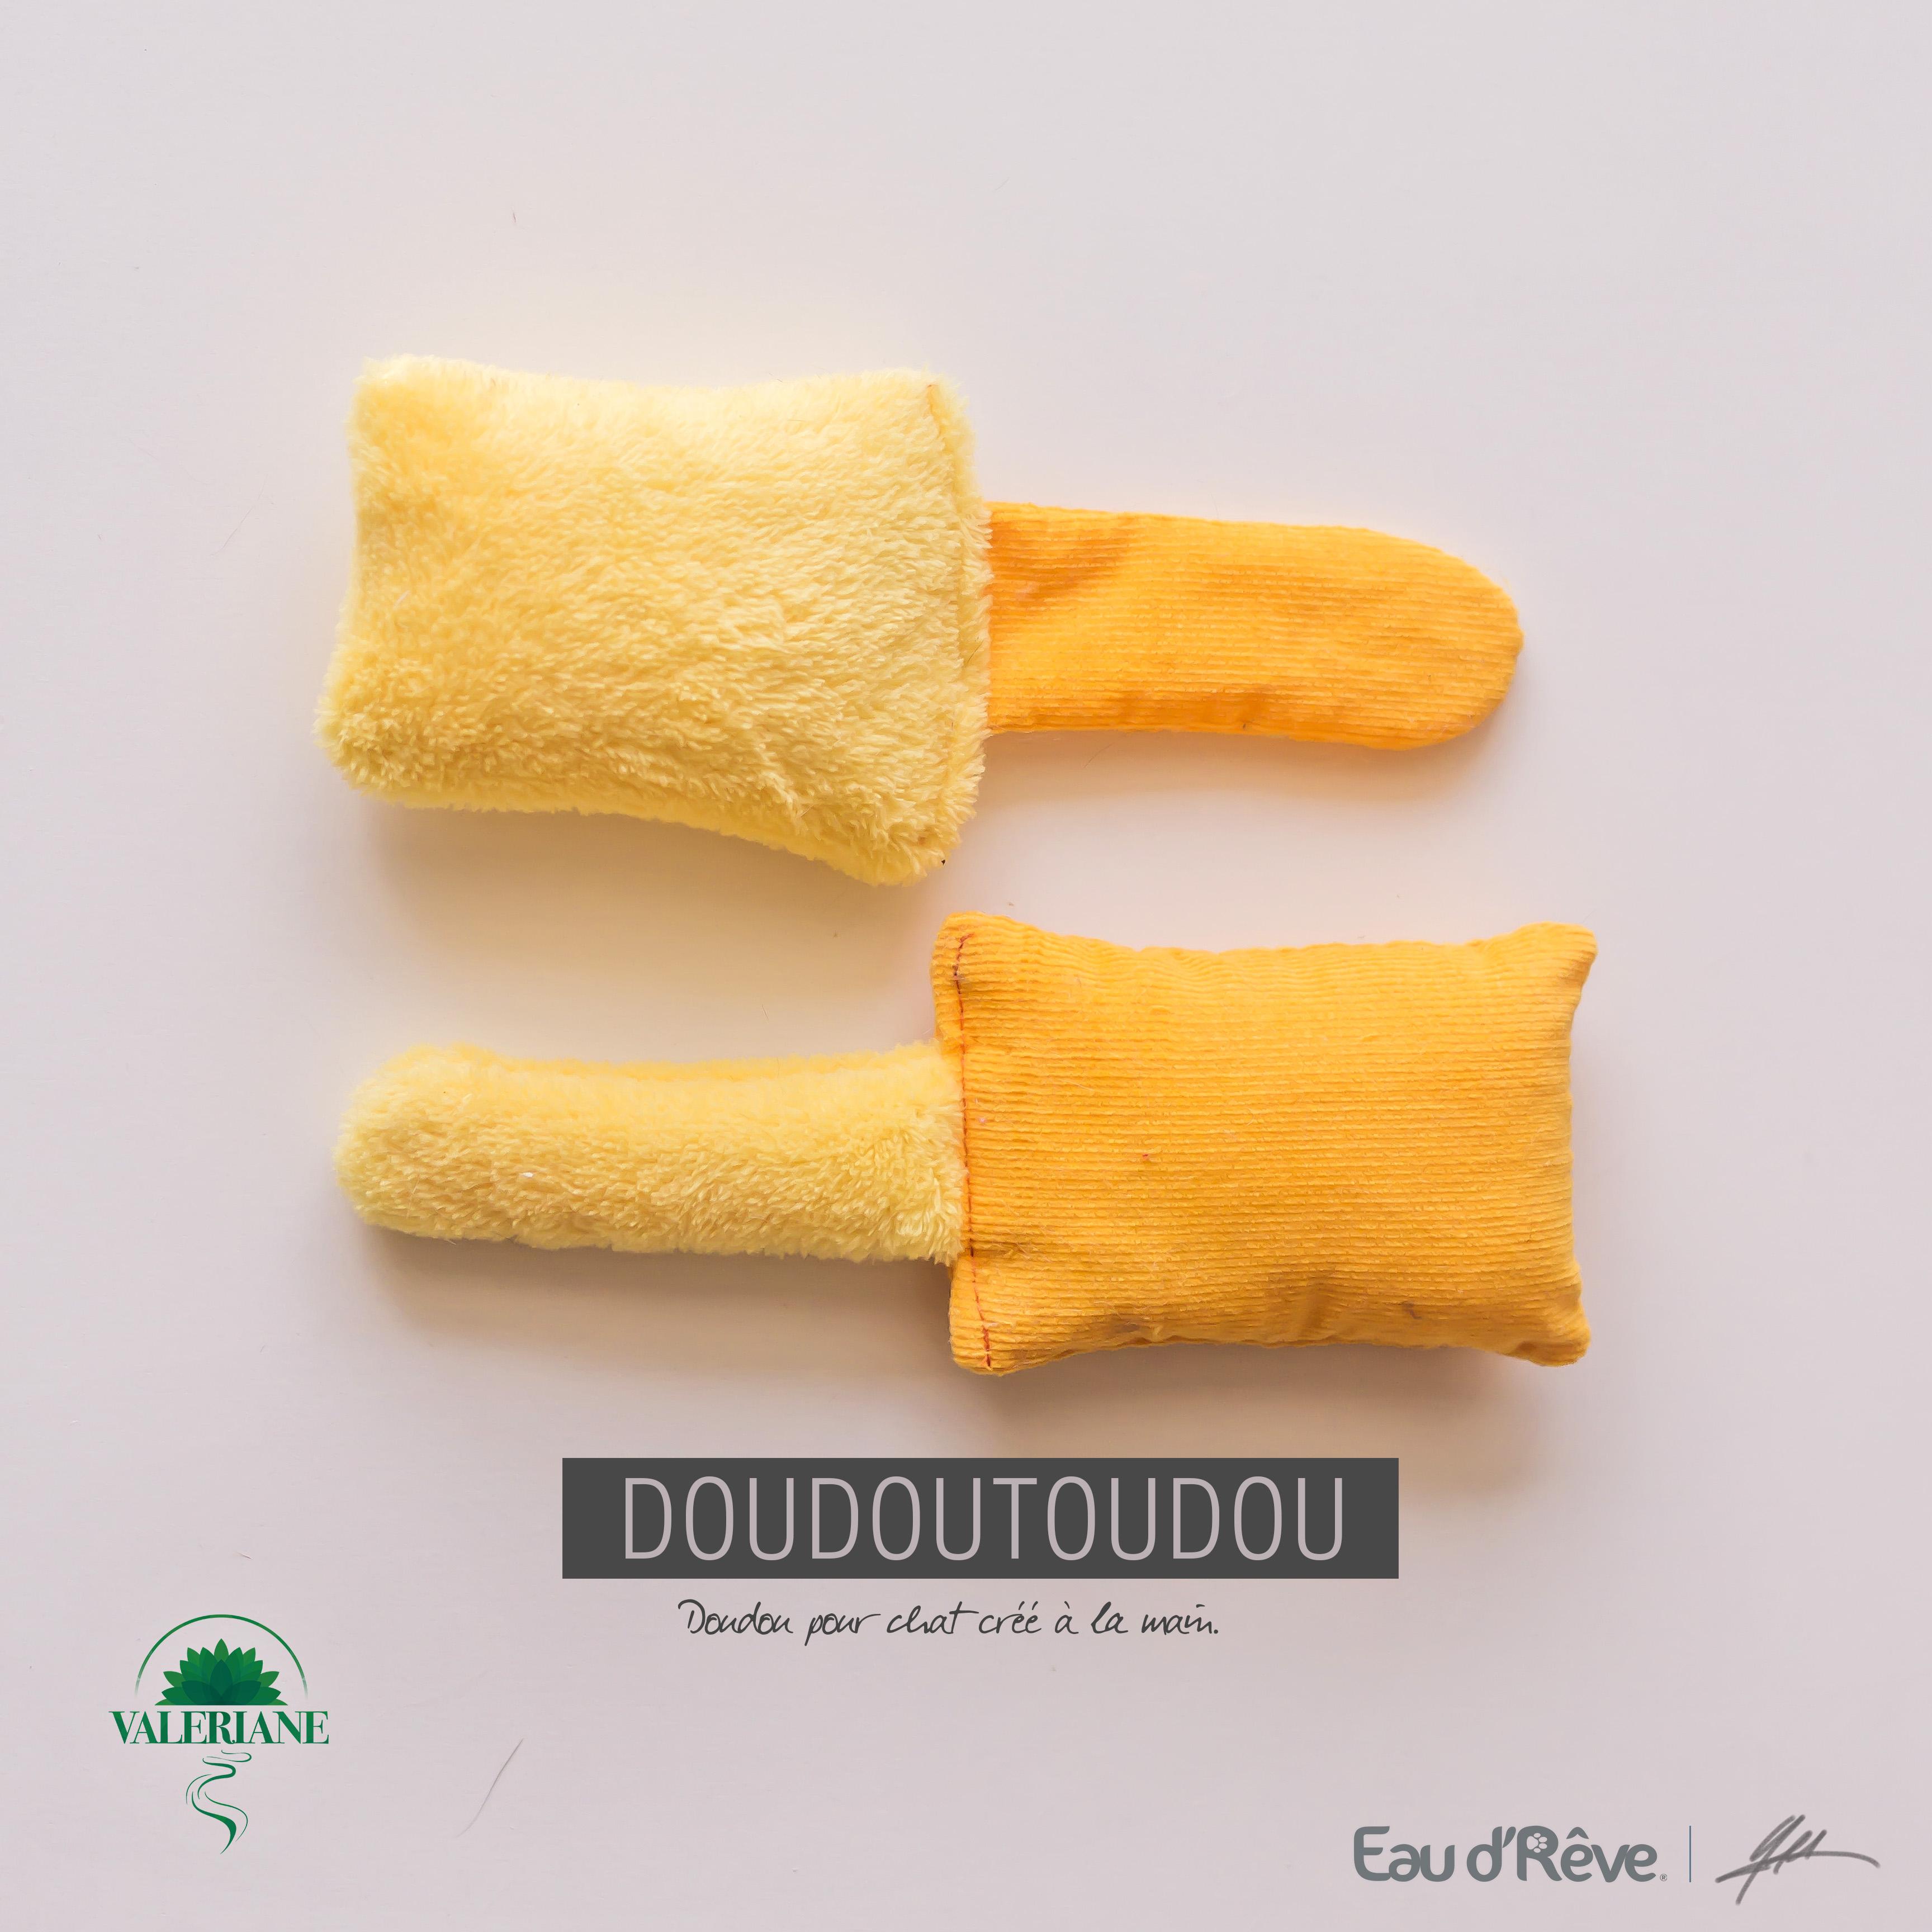 DOUDOUTOUDOU-02